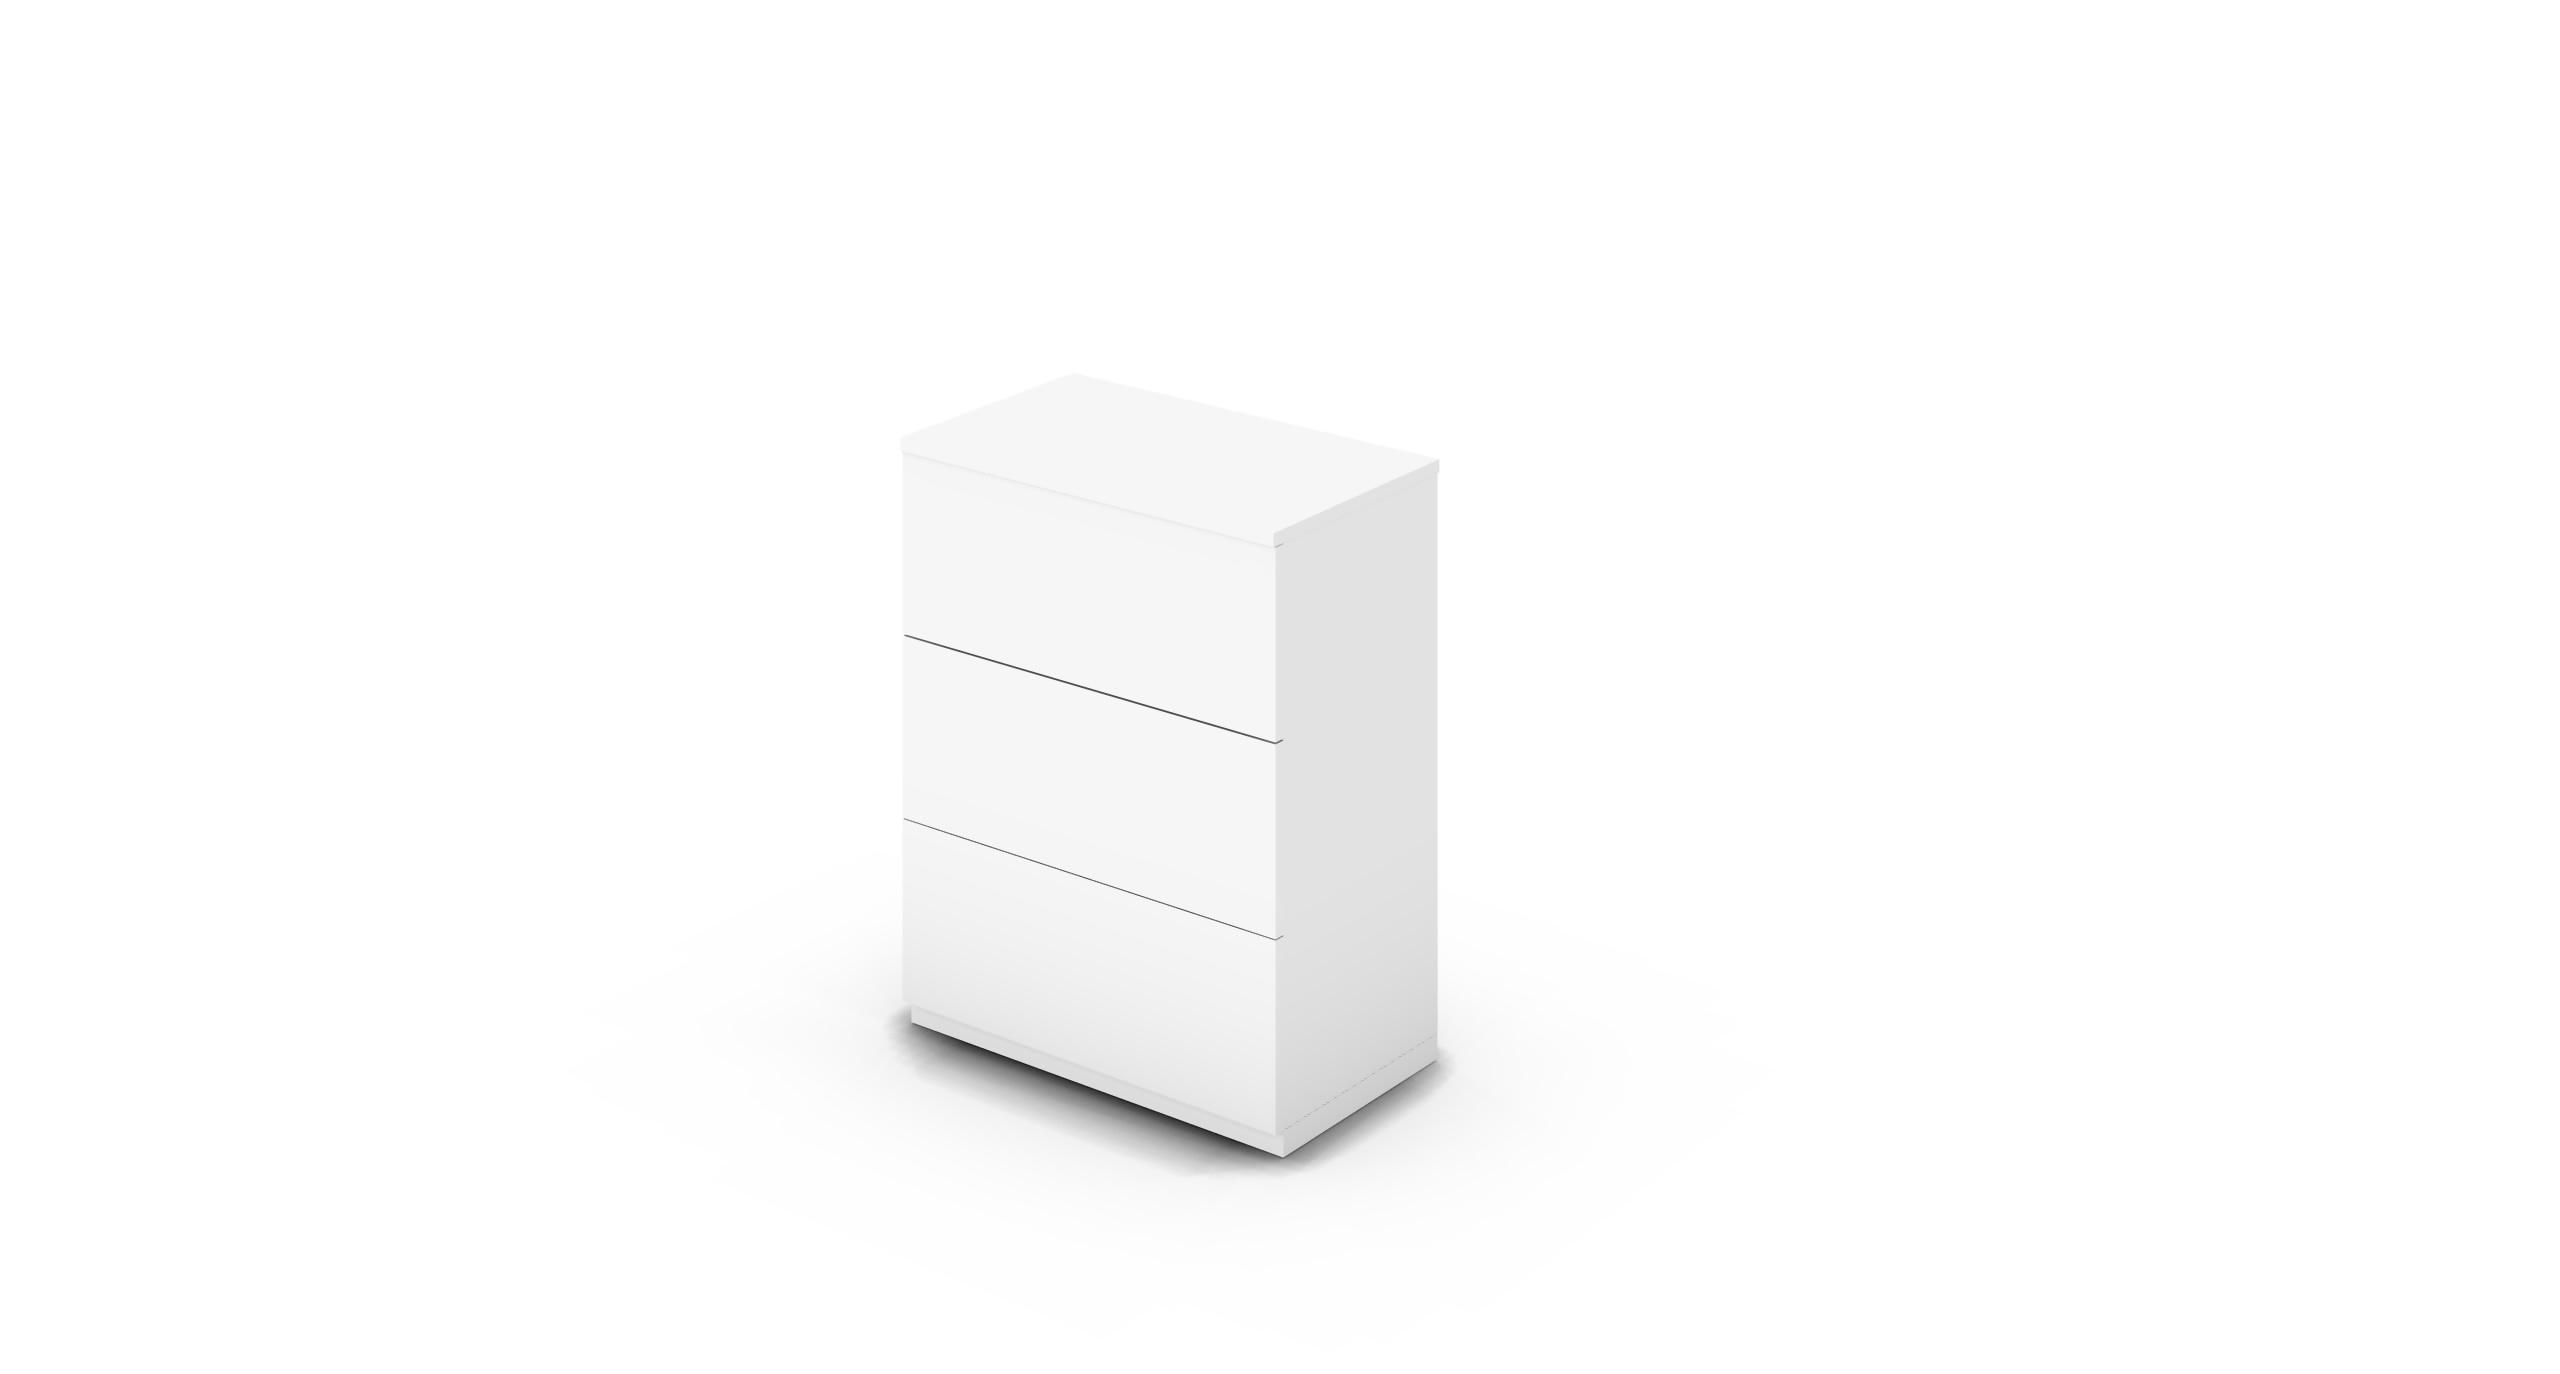 Cabinet_800x450x1125_DR_White_Push_NoCylinder